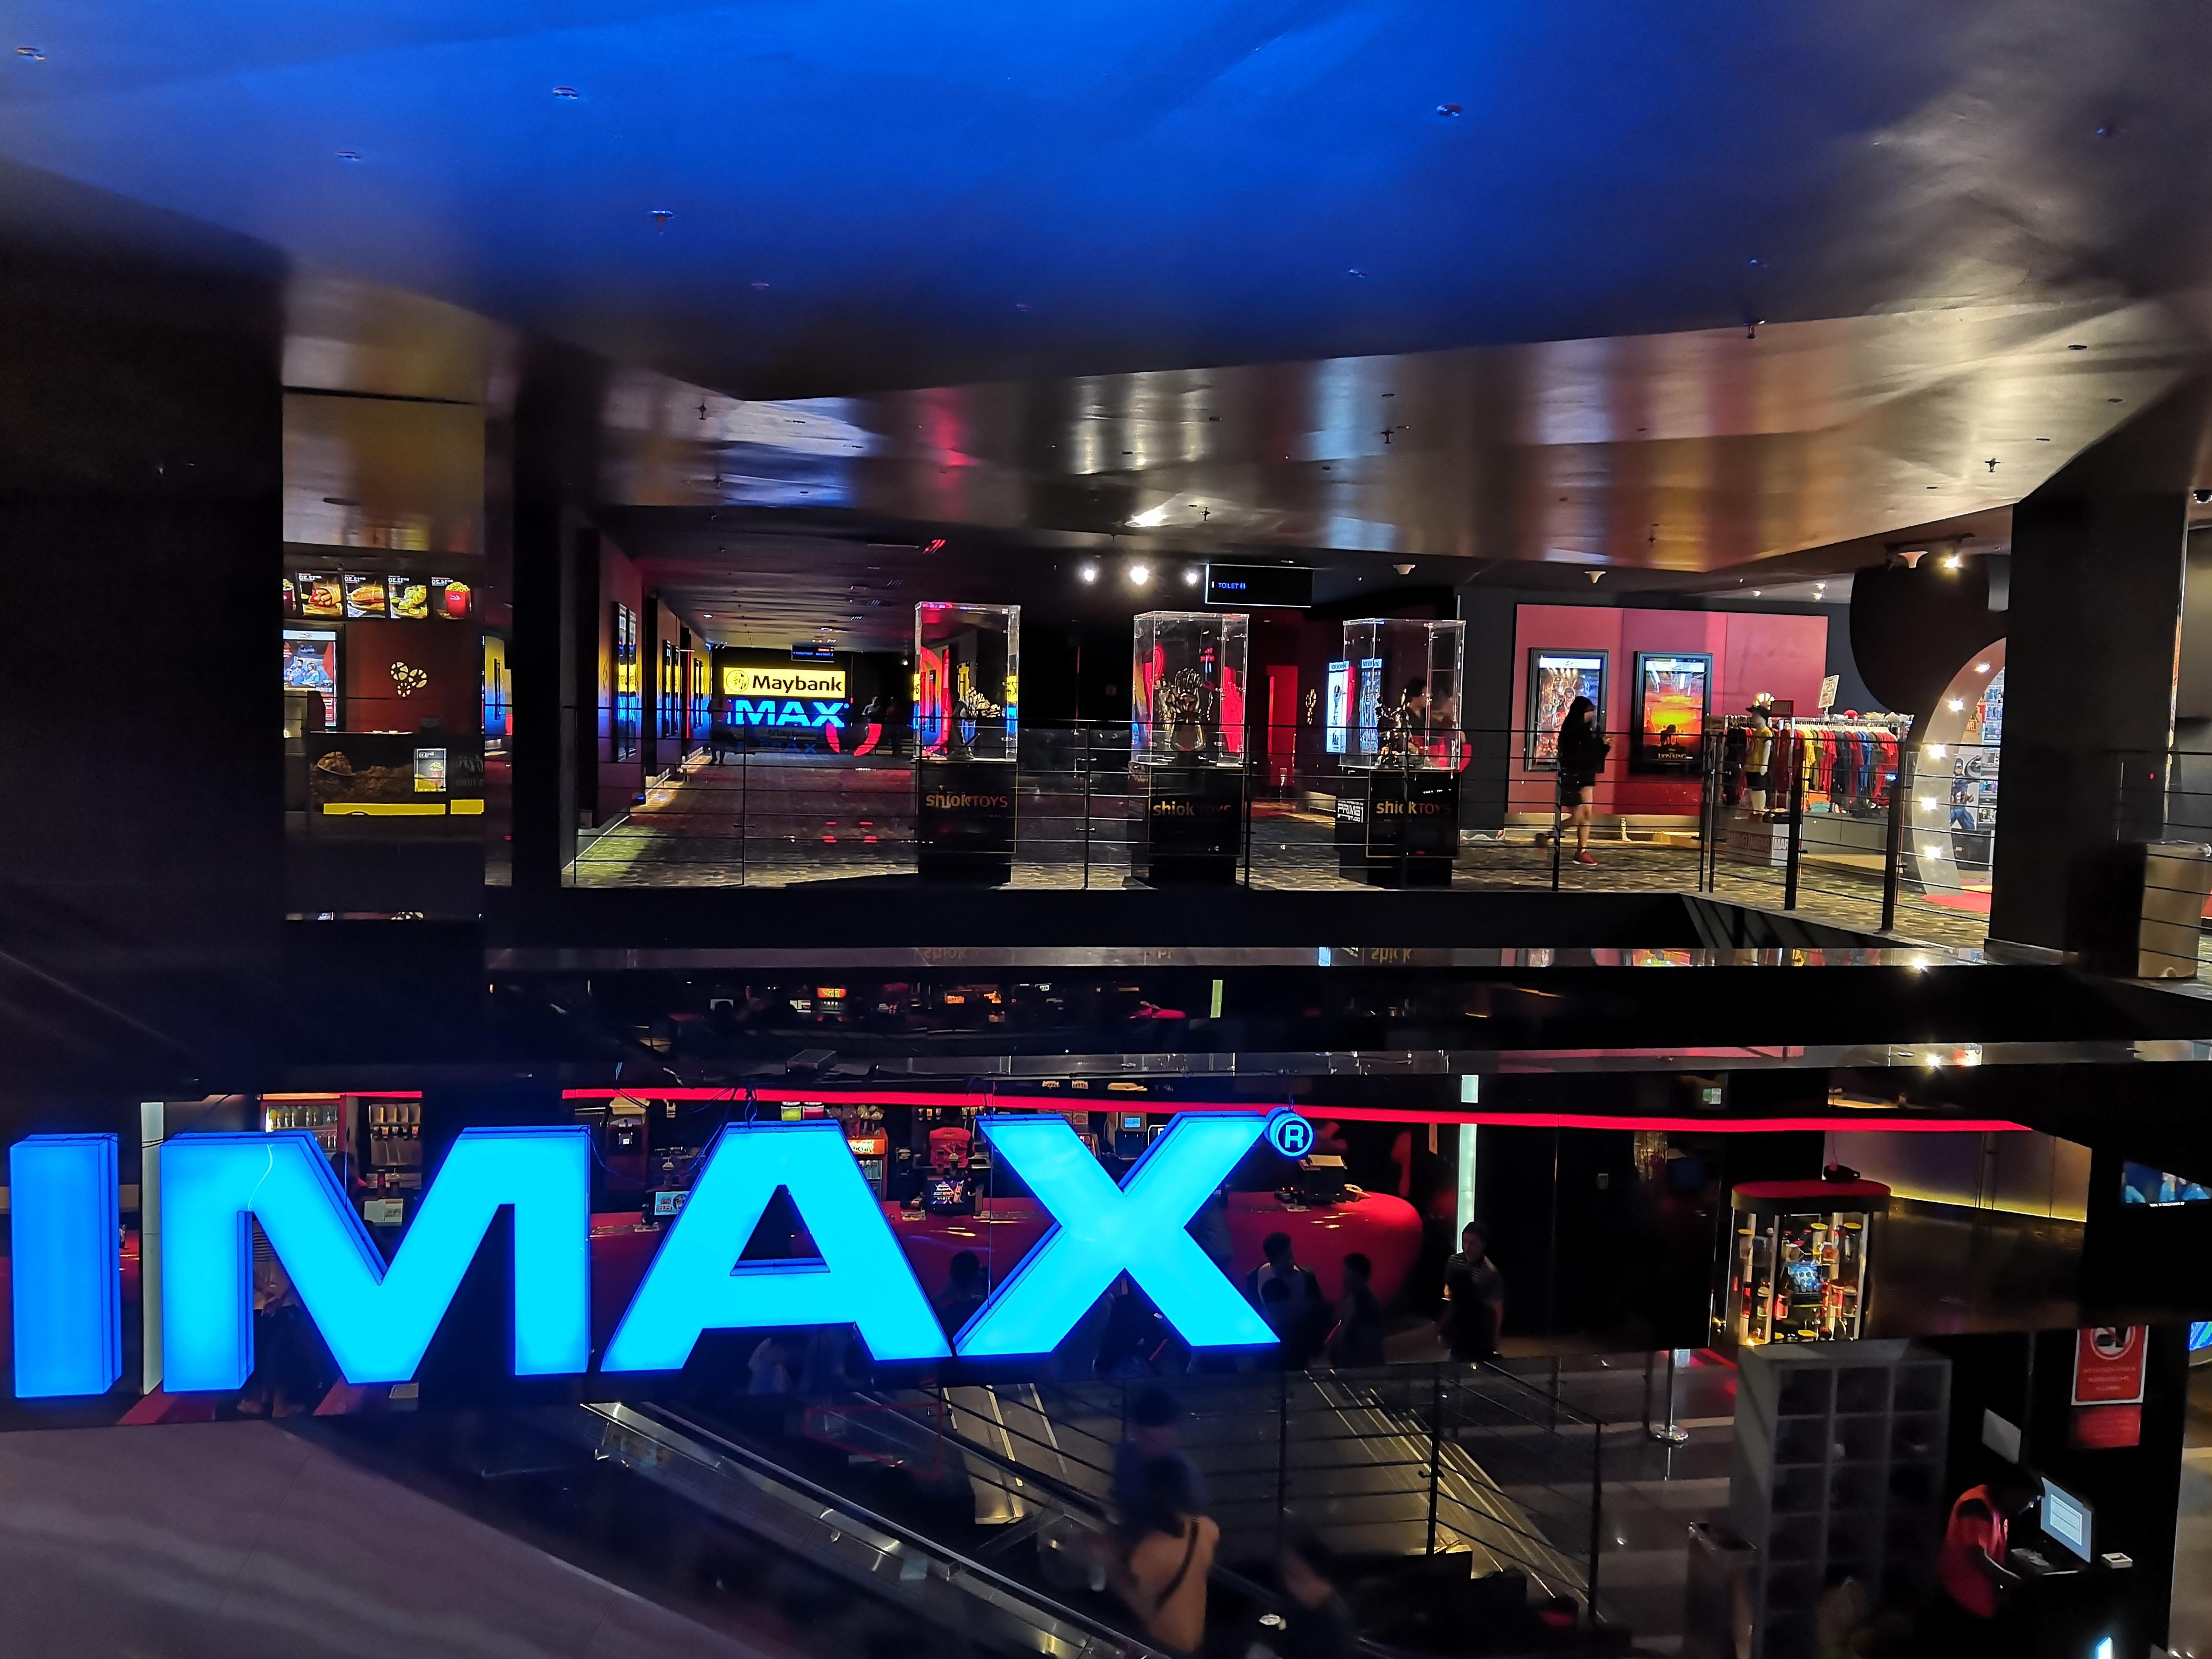 IMAX shutterstock_1437996518 copy